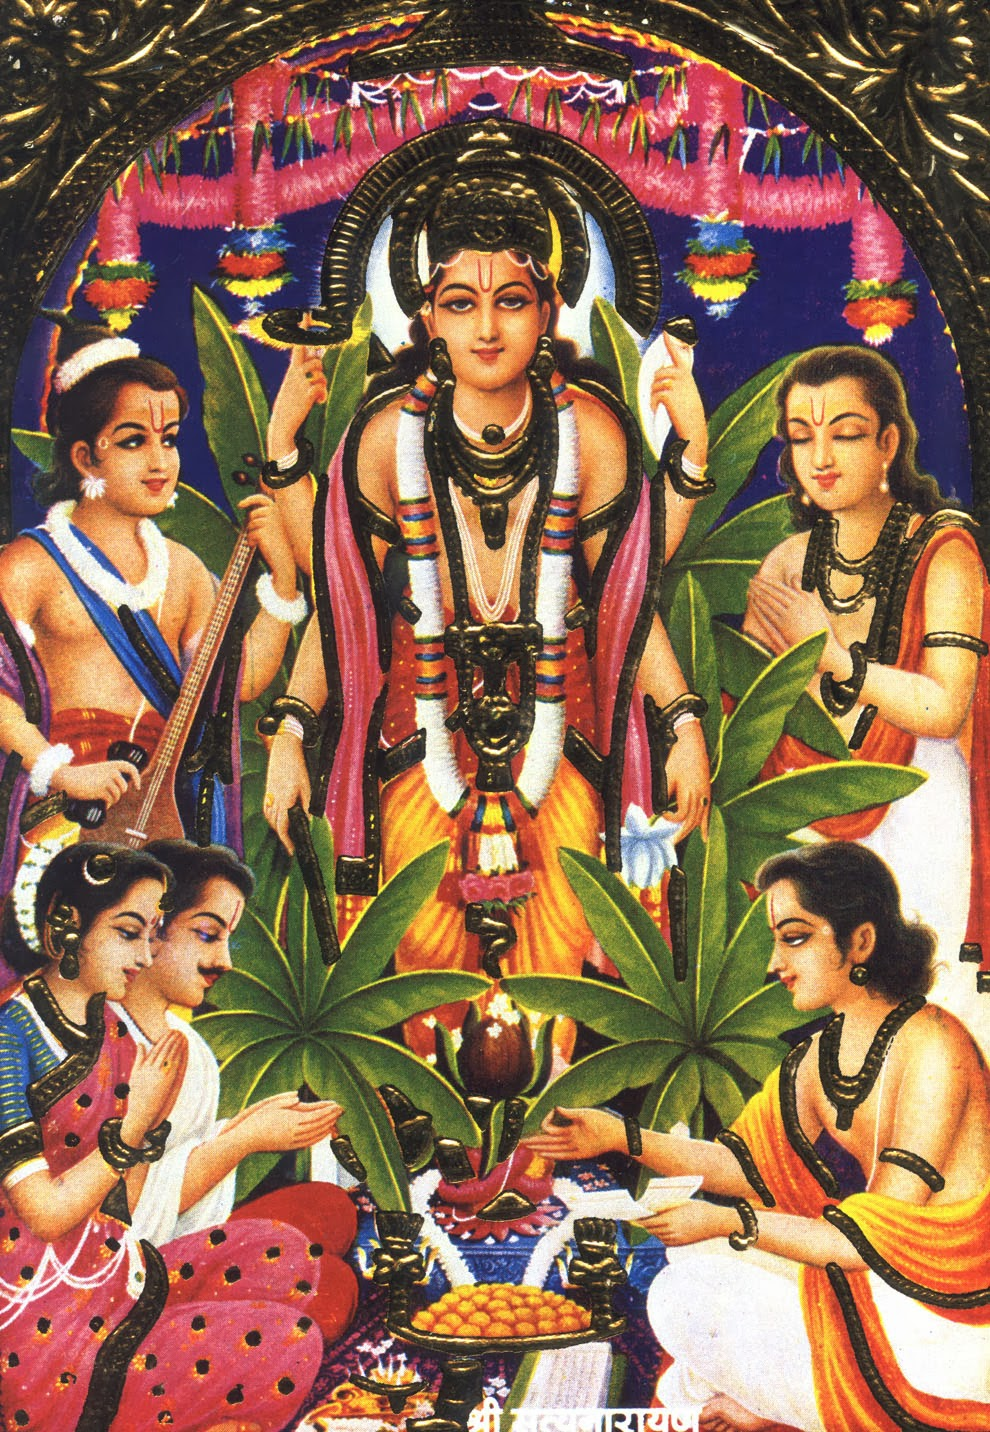 Sanjjanaa's Profile, Galleries, Wallpapers, Movies, News